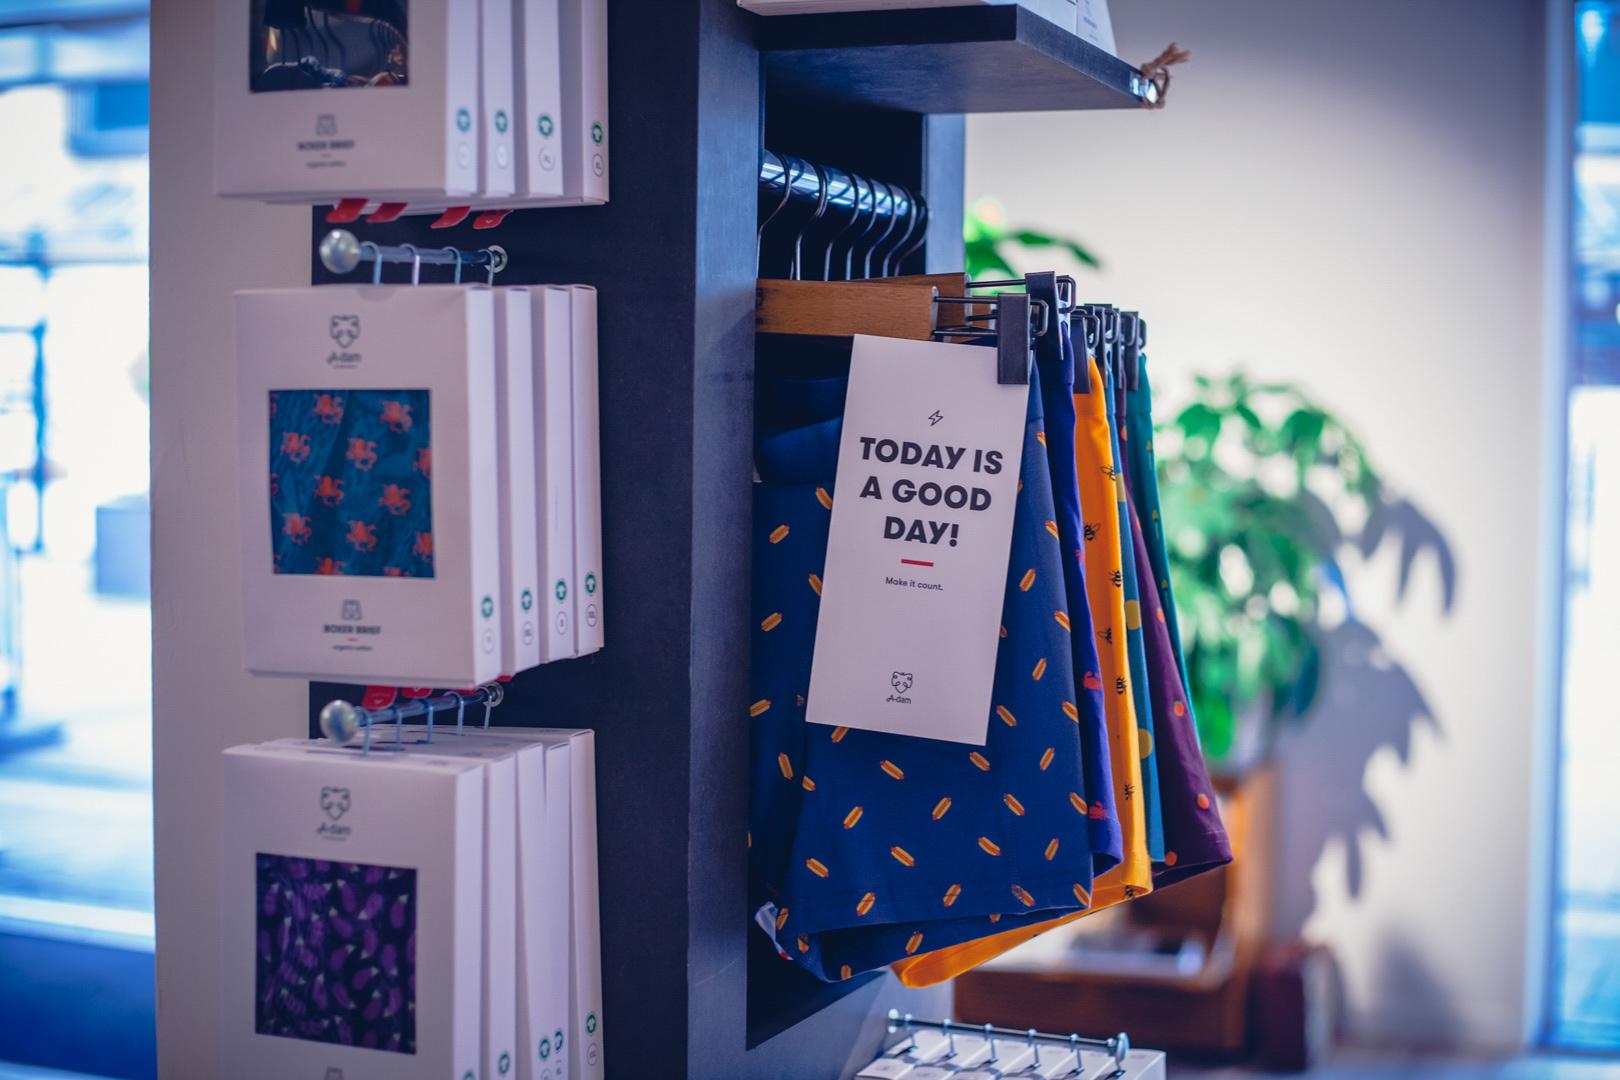 https://bilow-underwear.nl/wp-content/uploads/2020/10/Bilow-Underwear-Beuningen-Collectie-27.jpg